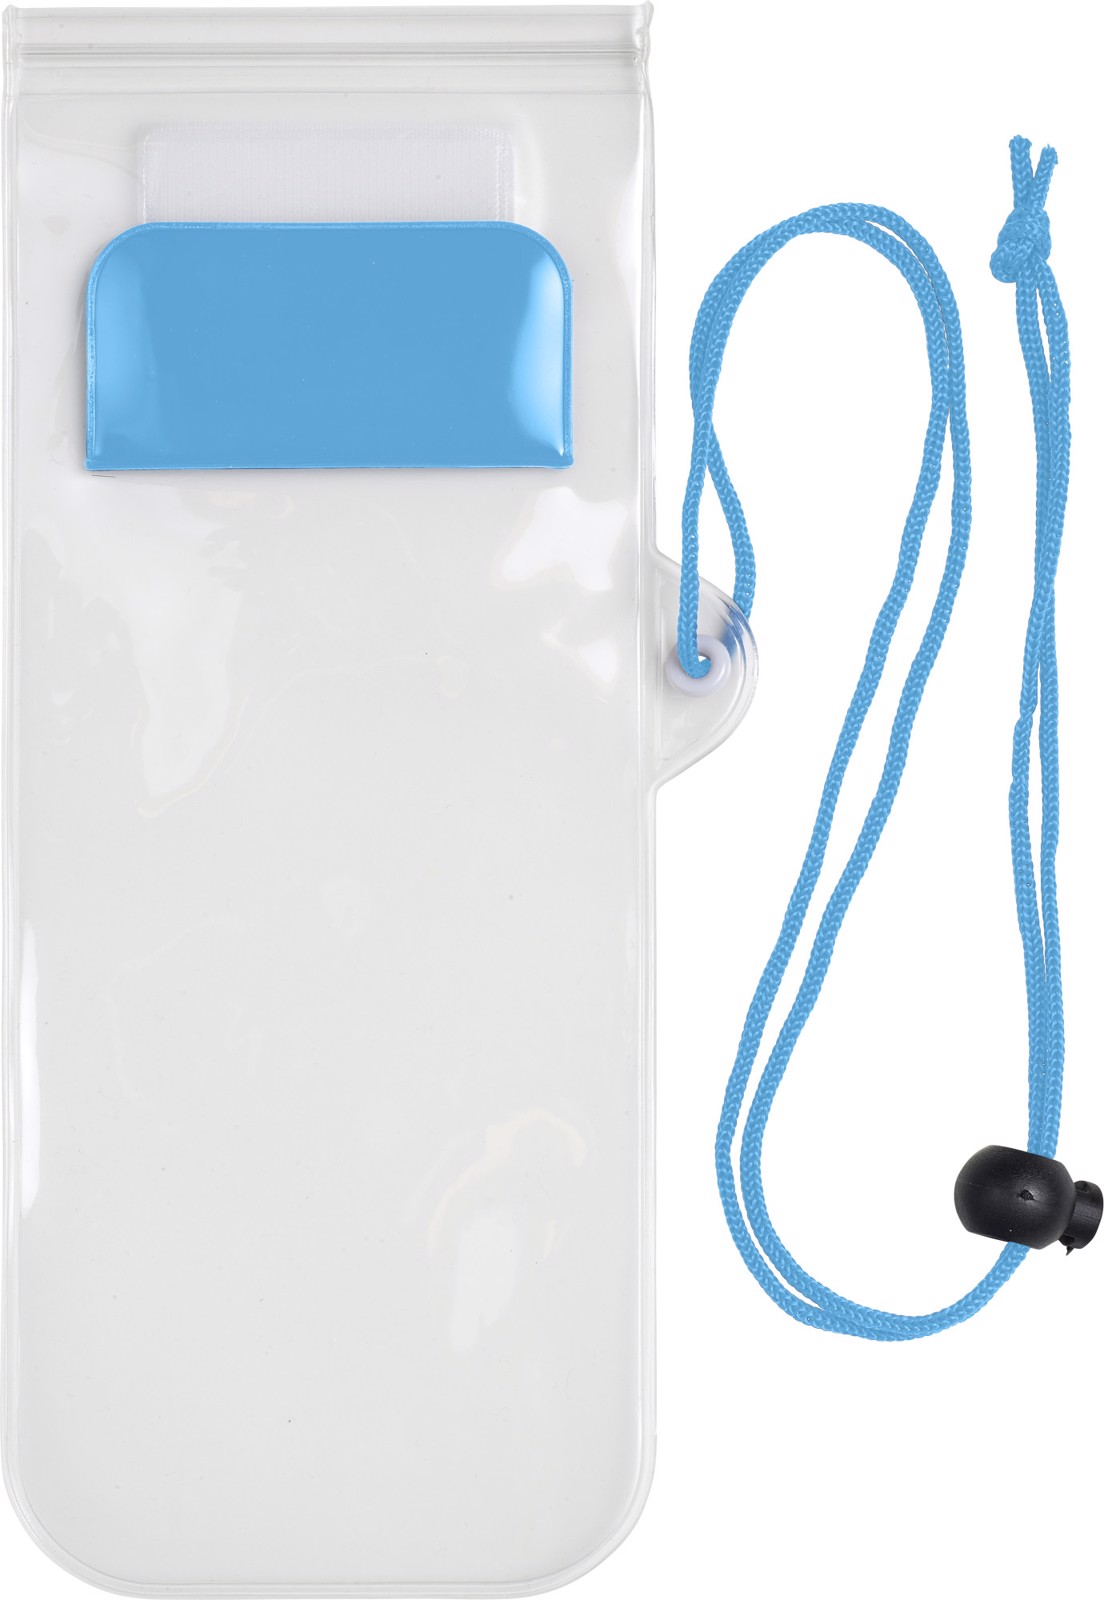 PVC pouch for mobile devices - Light Blue